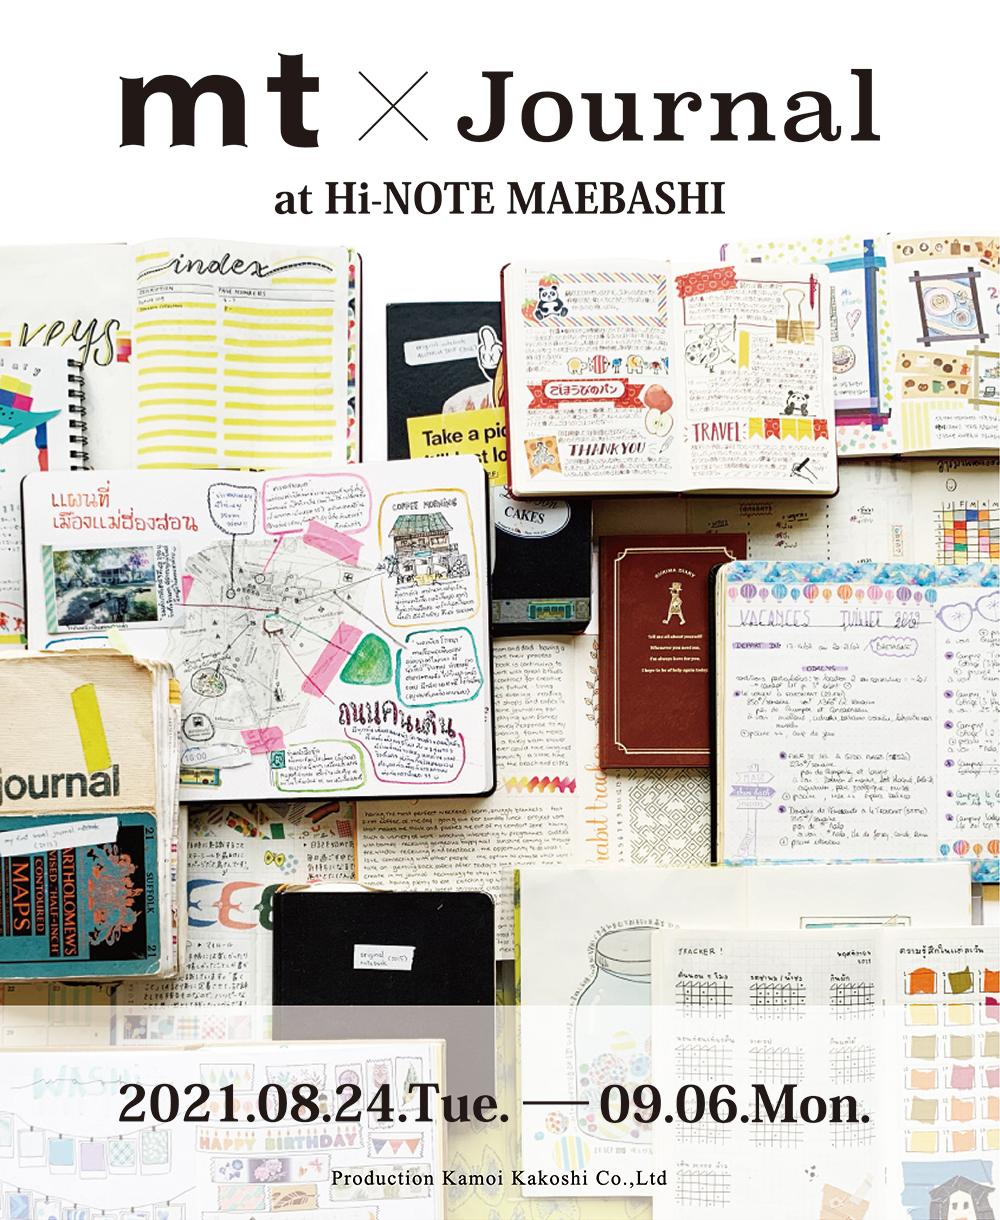 ◎mt×Journal at Hi-NOTE MAEBASHI開催のお知らせ